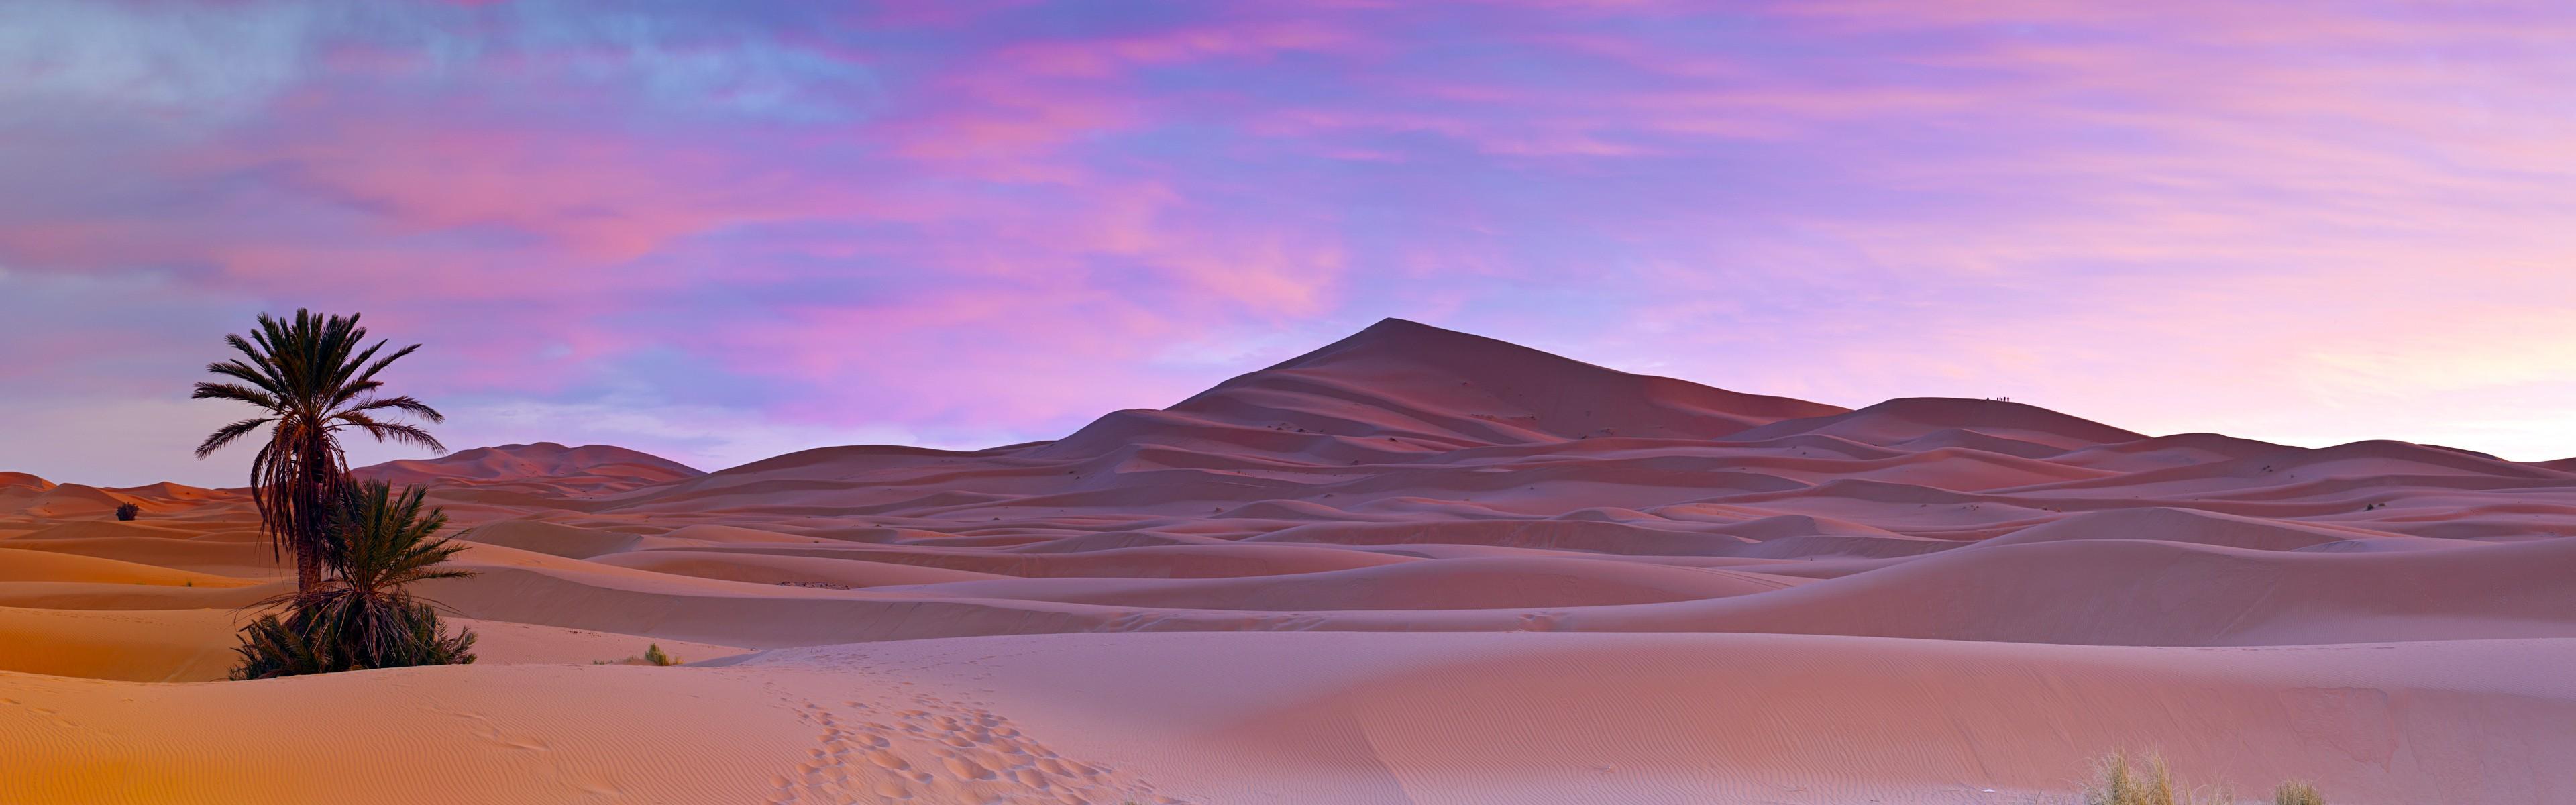 Cute Lock Screen Wallpapers For Ipad Palm Trees Sahara Desert Morocco Wallpapers Hd